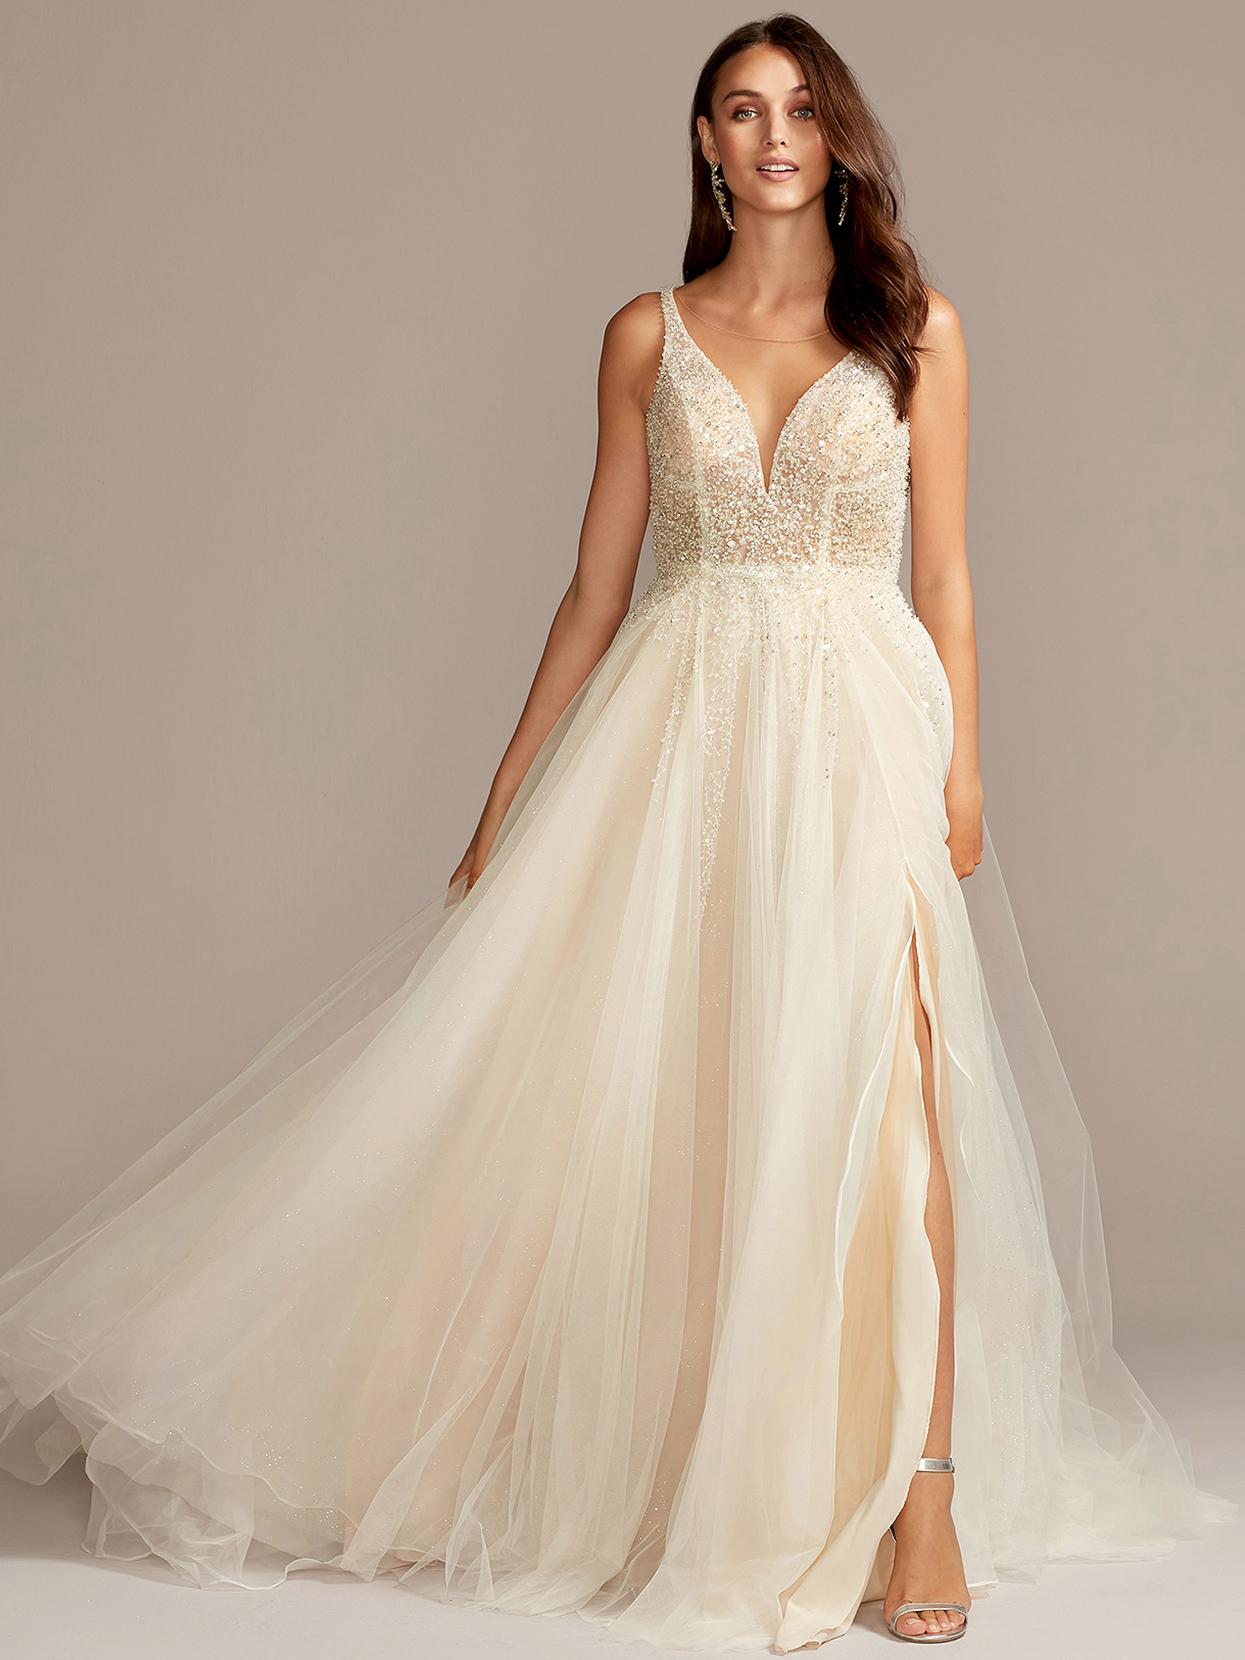 davids bridal galina champagne embellished a-line wedding dress fall 2020